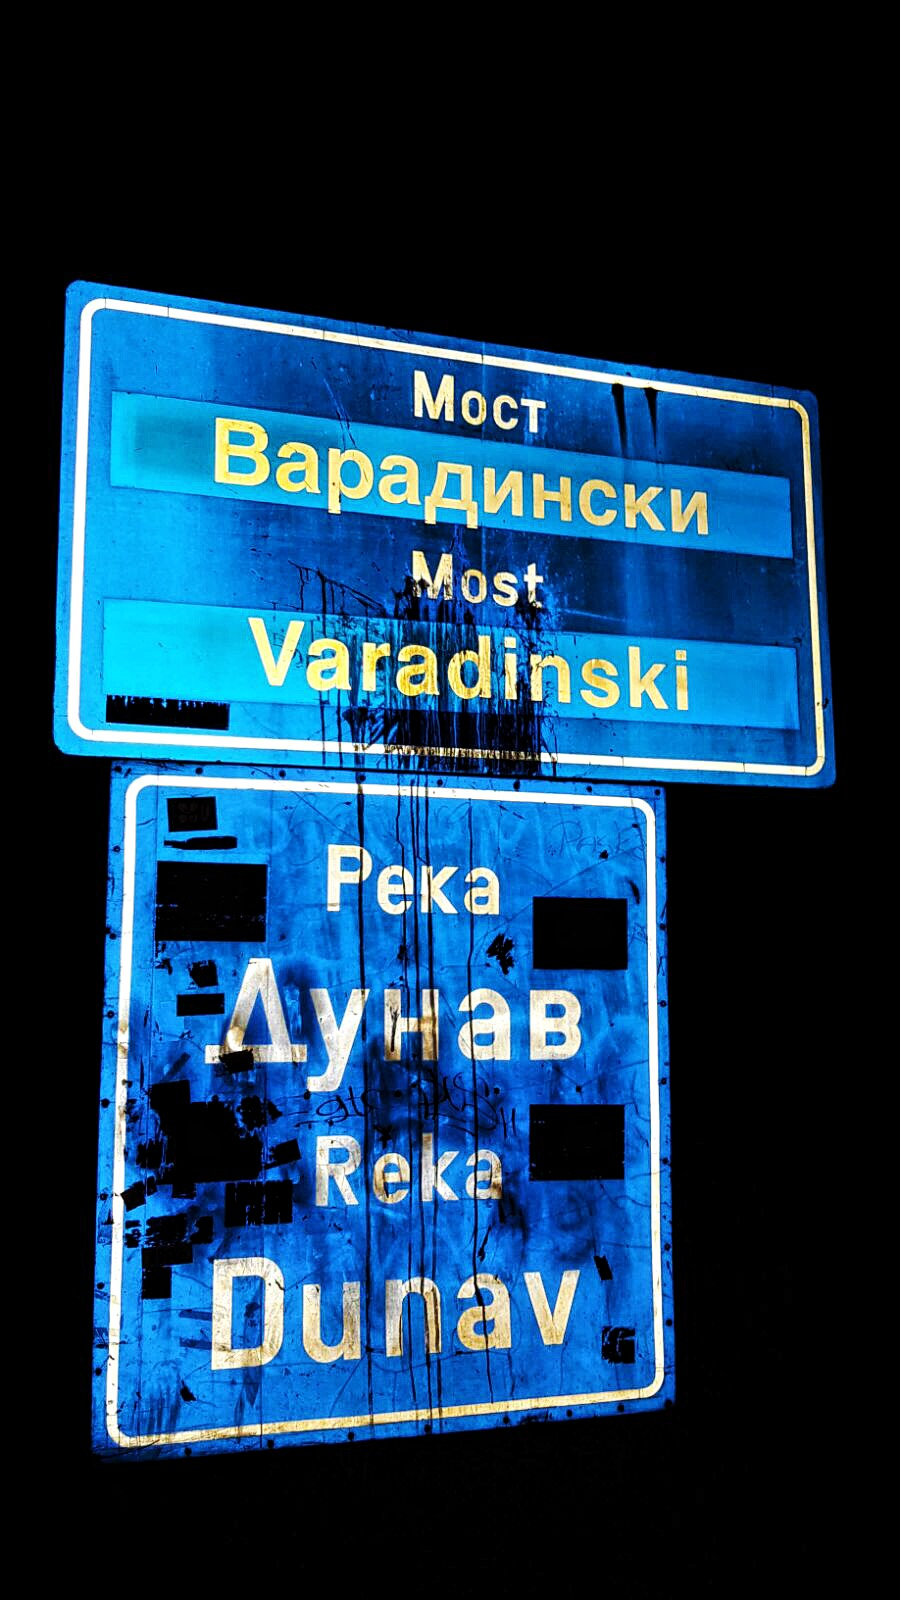 Serbian Street Sign